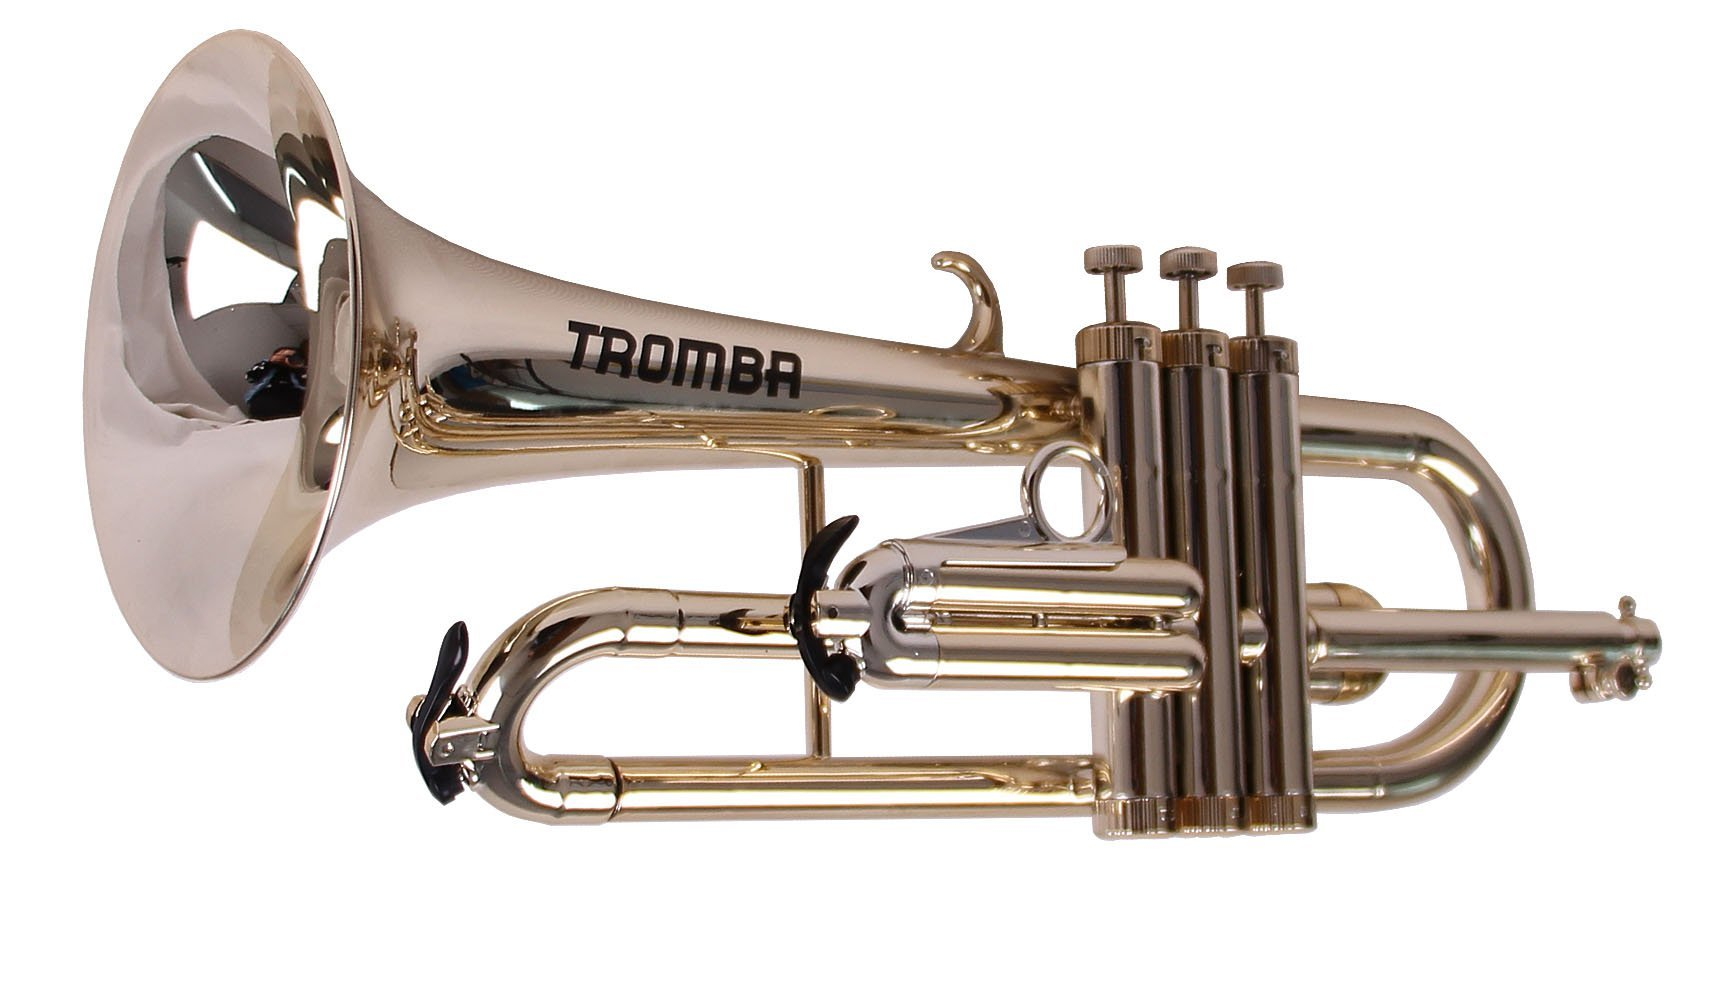 Tromba Pro Professional Plastic Bb Flugelhorn, Golden by Tromba